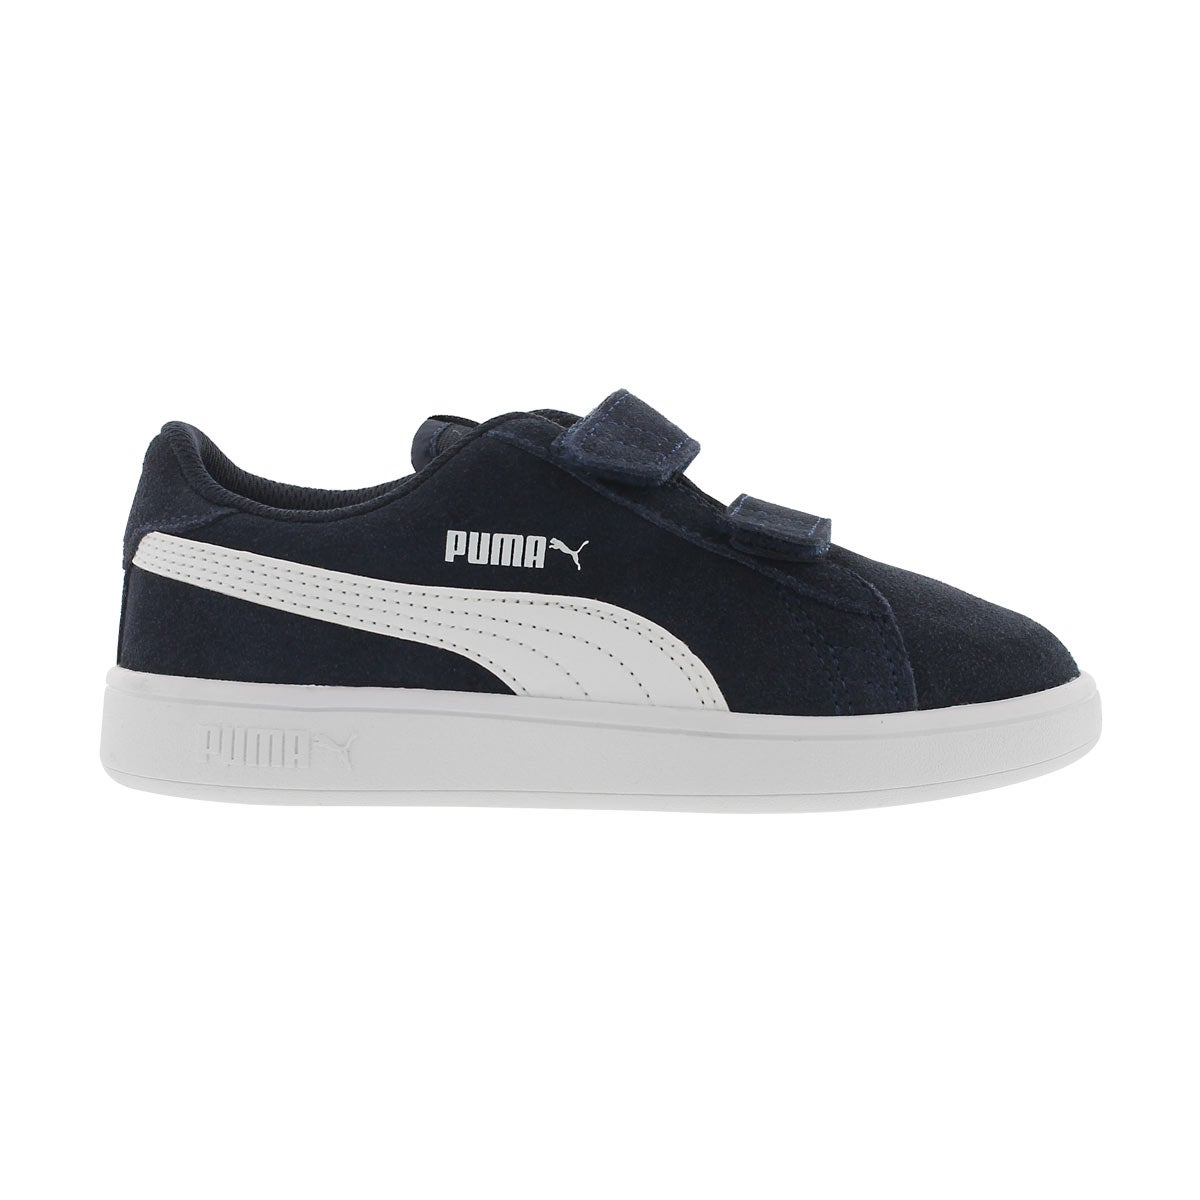 Bys Puma Smash v2 peacoat sneaker